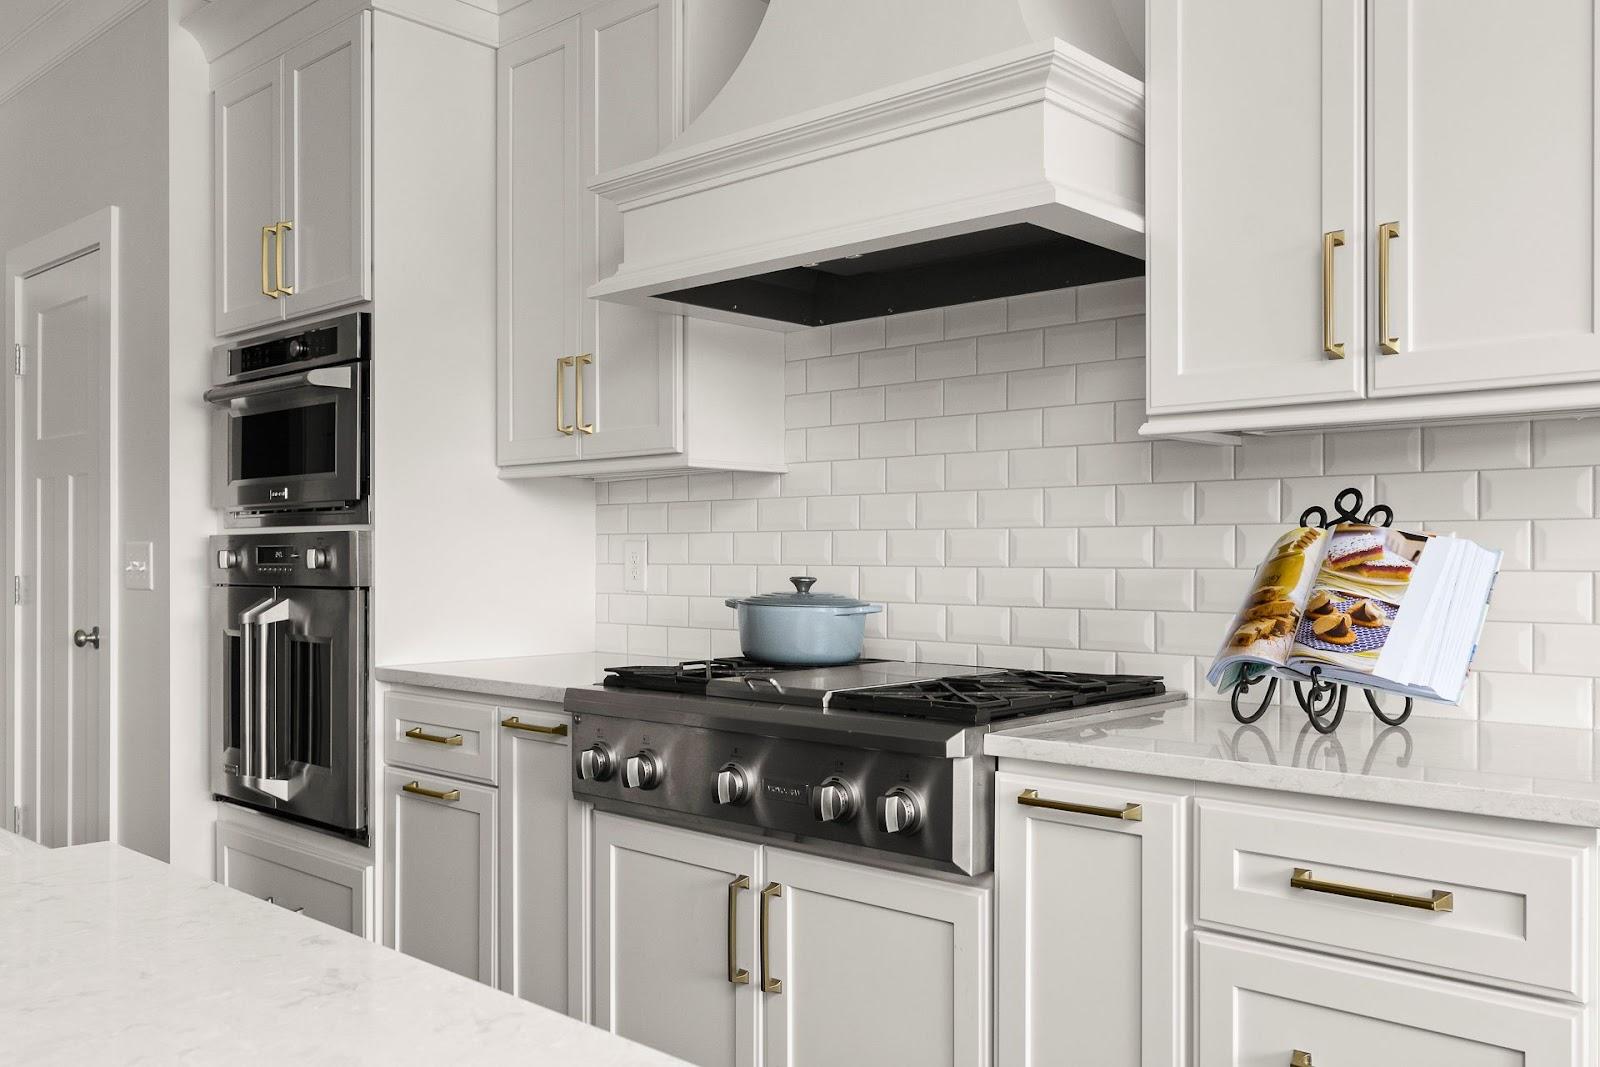 superior-construction-mt-juliet-tn-porcelain-vs-ceramic-kitchen-backsplash-with-white-ceramic-tile